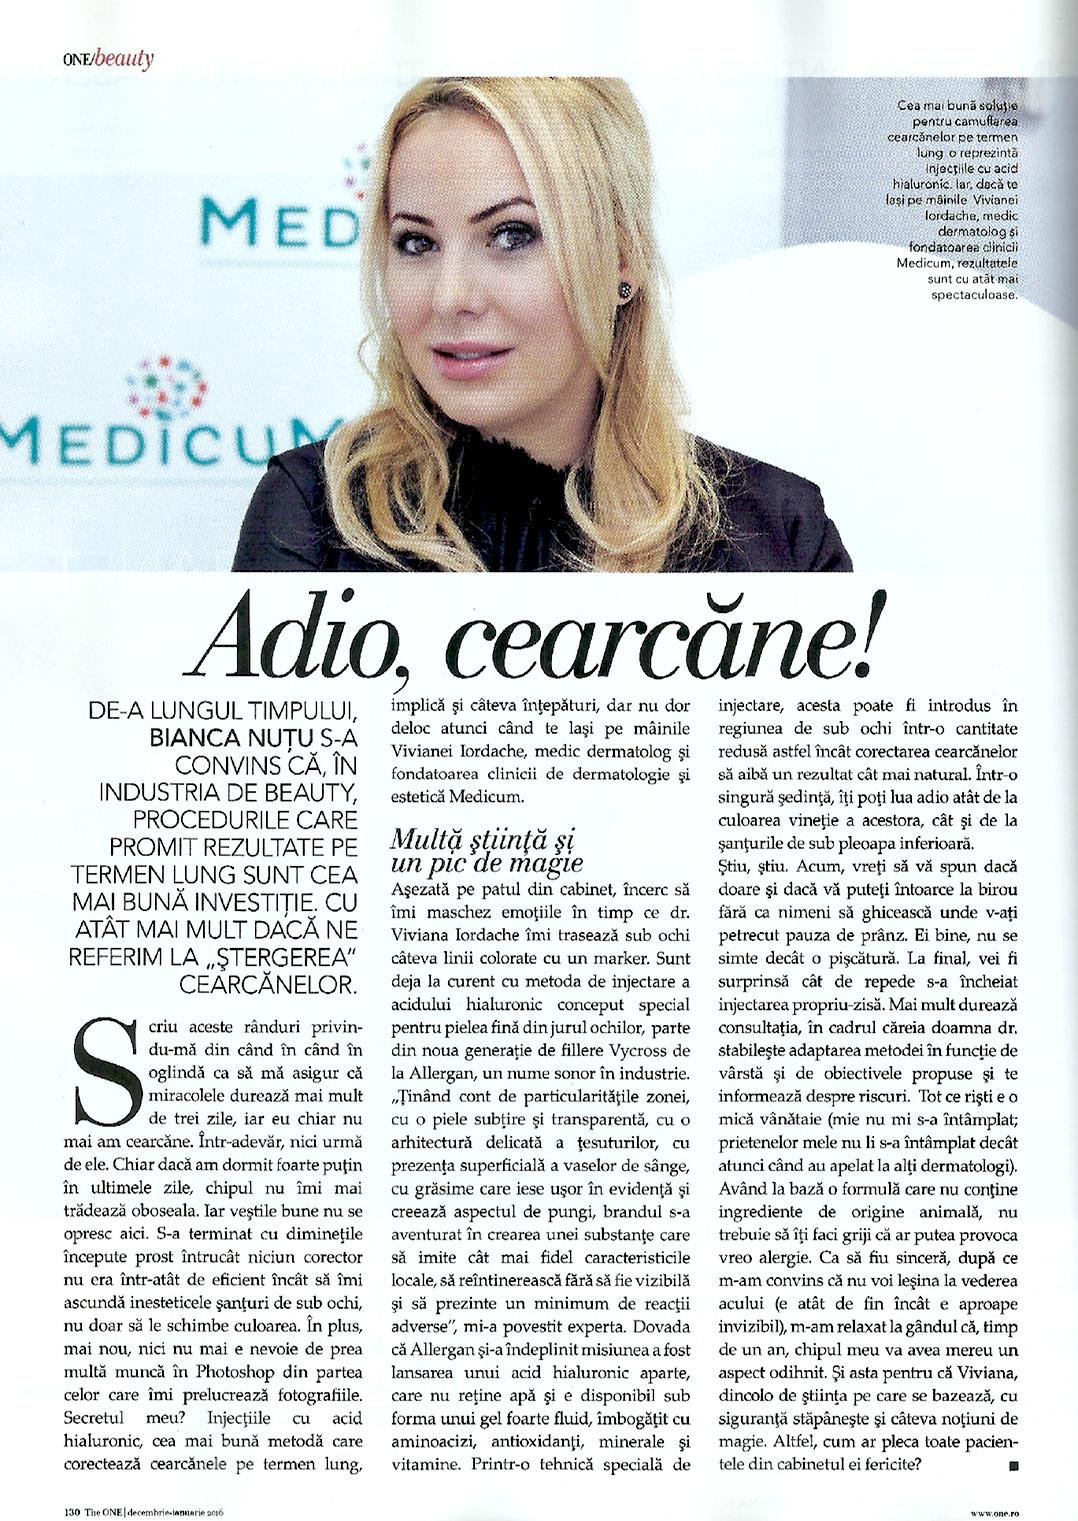 Doctor Viviana Iordache